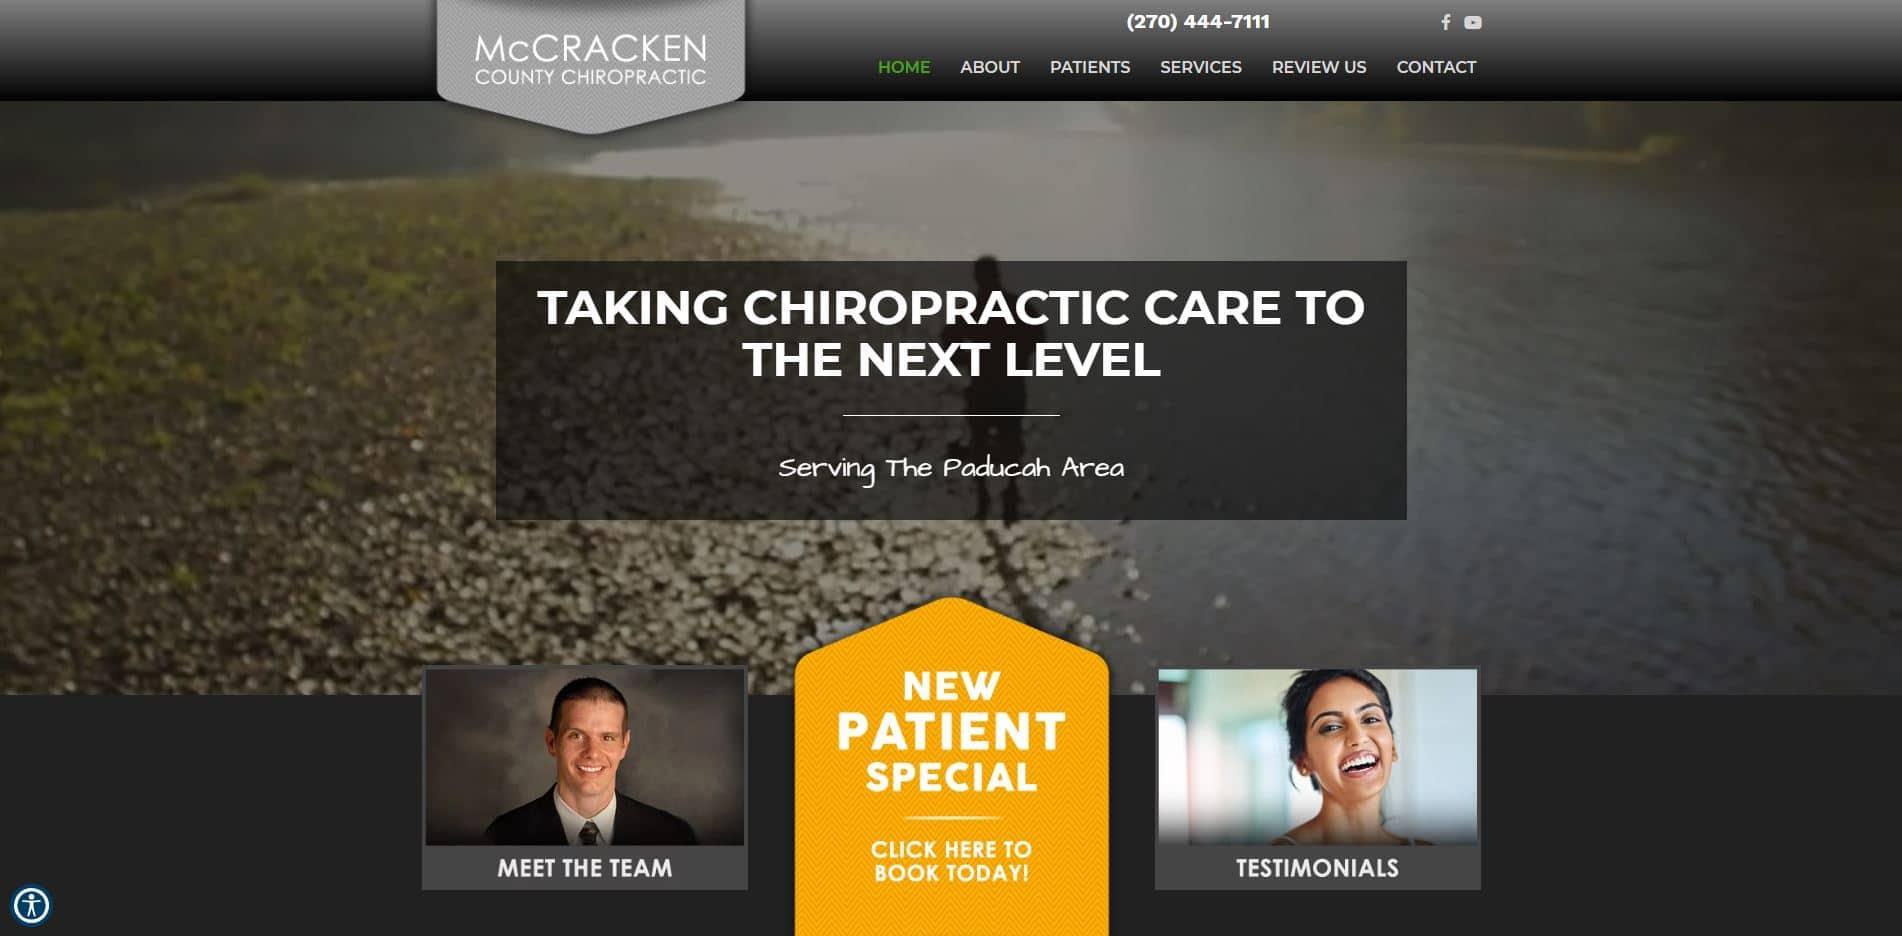 Chiropractor in Paducah